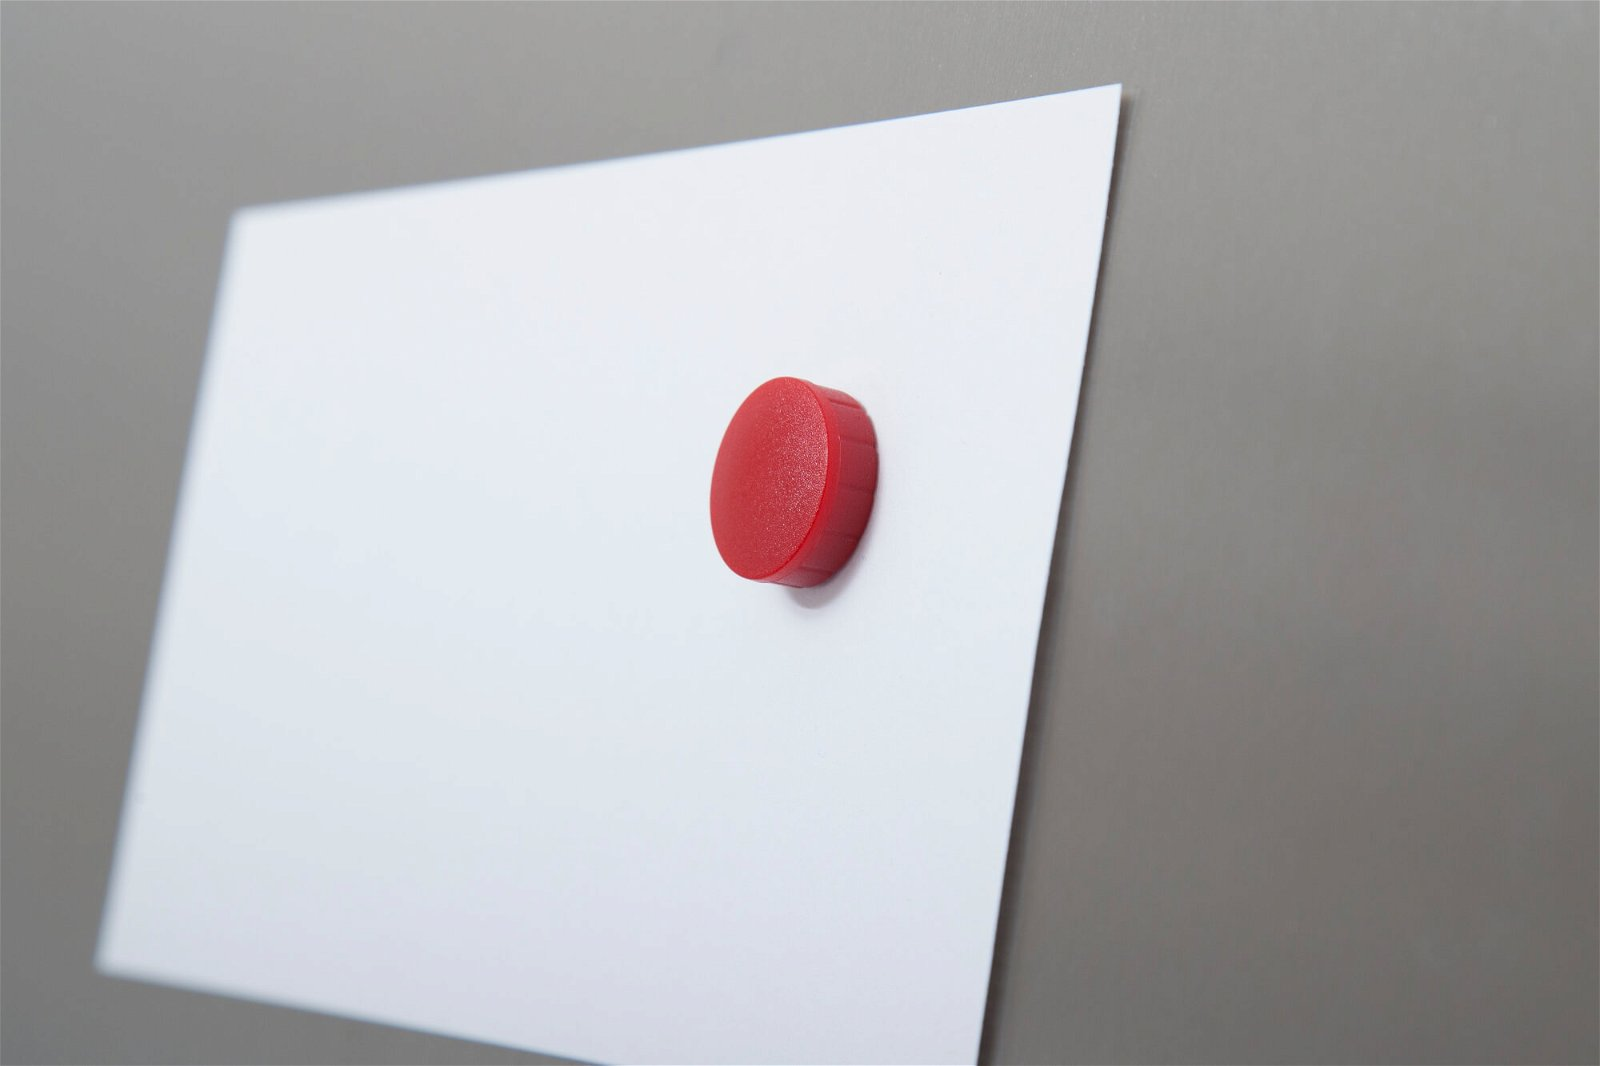 Magnet MAULsolid Ø 20 mm, 0,3 kg Haftkraft, 10 St./Ktn., rot